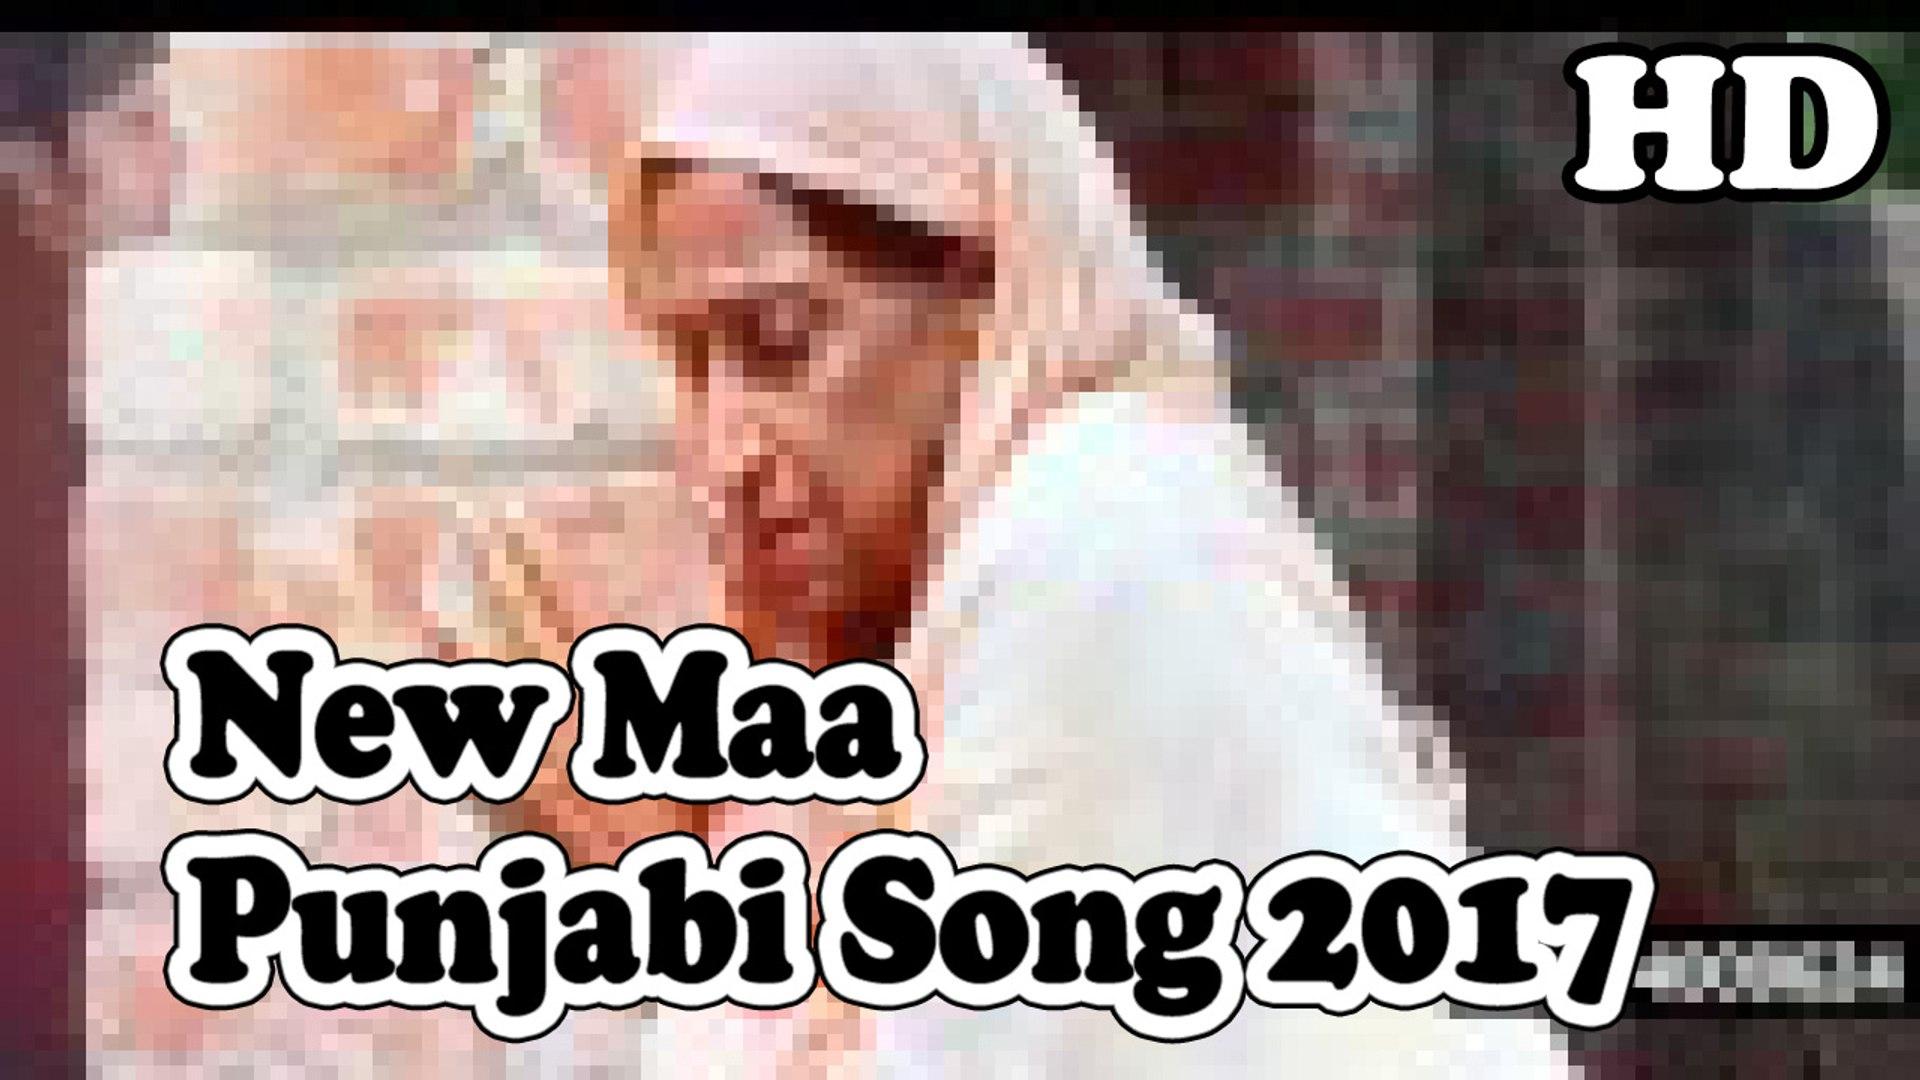 New Maa Punjabi Song